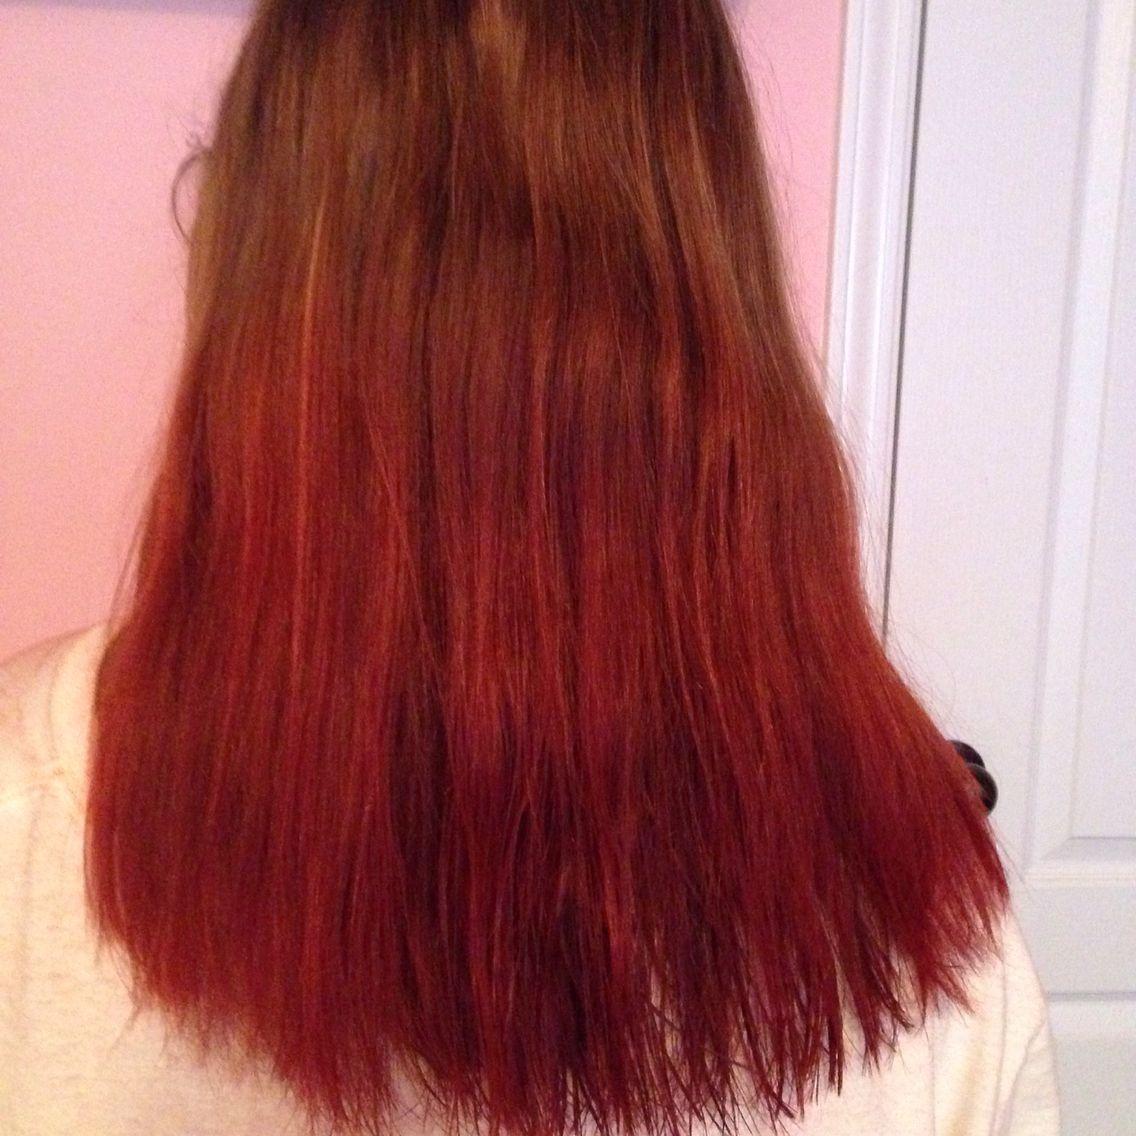 Kool Aid Hair Dye Black Cherry And Strawberry Kool Aid Hair Kool Aid Hair Dye Dip Dye Hair